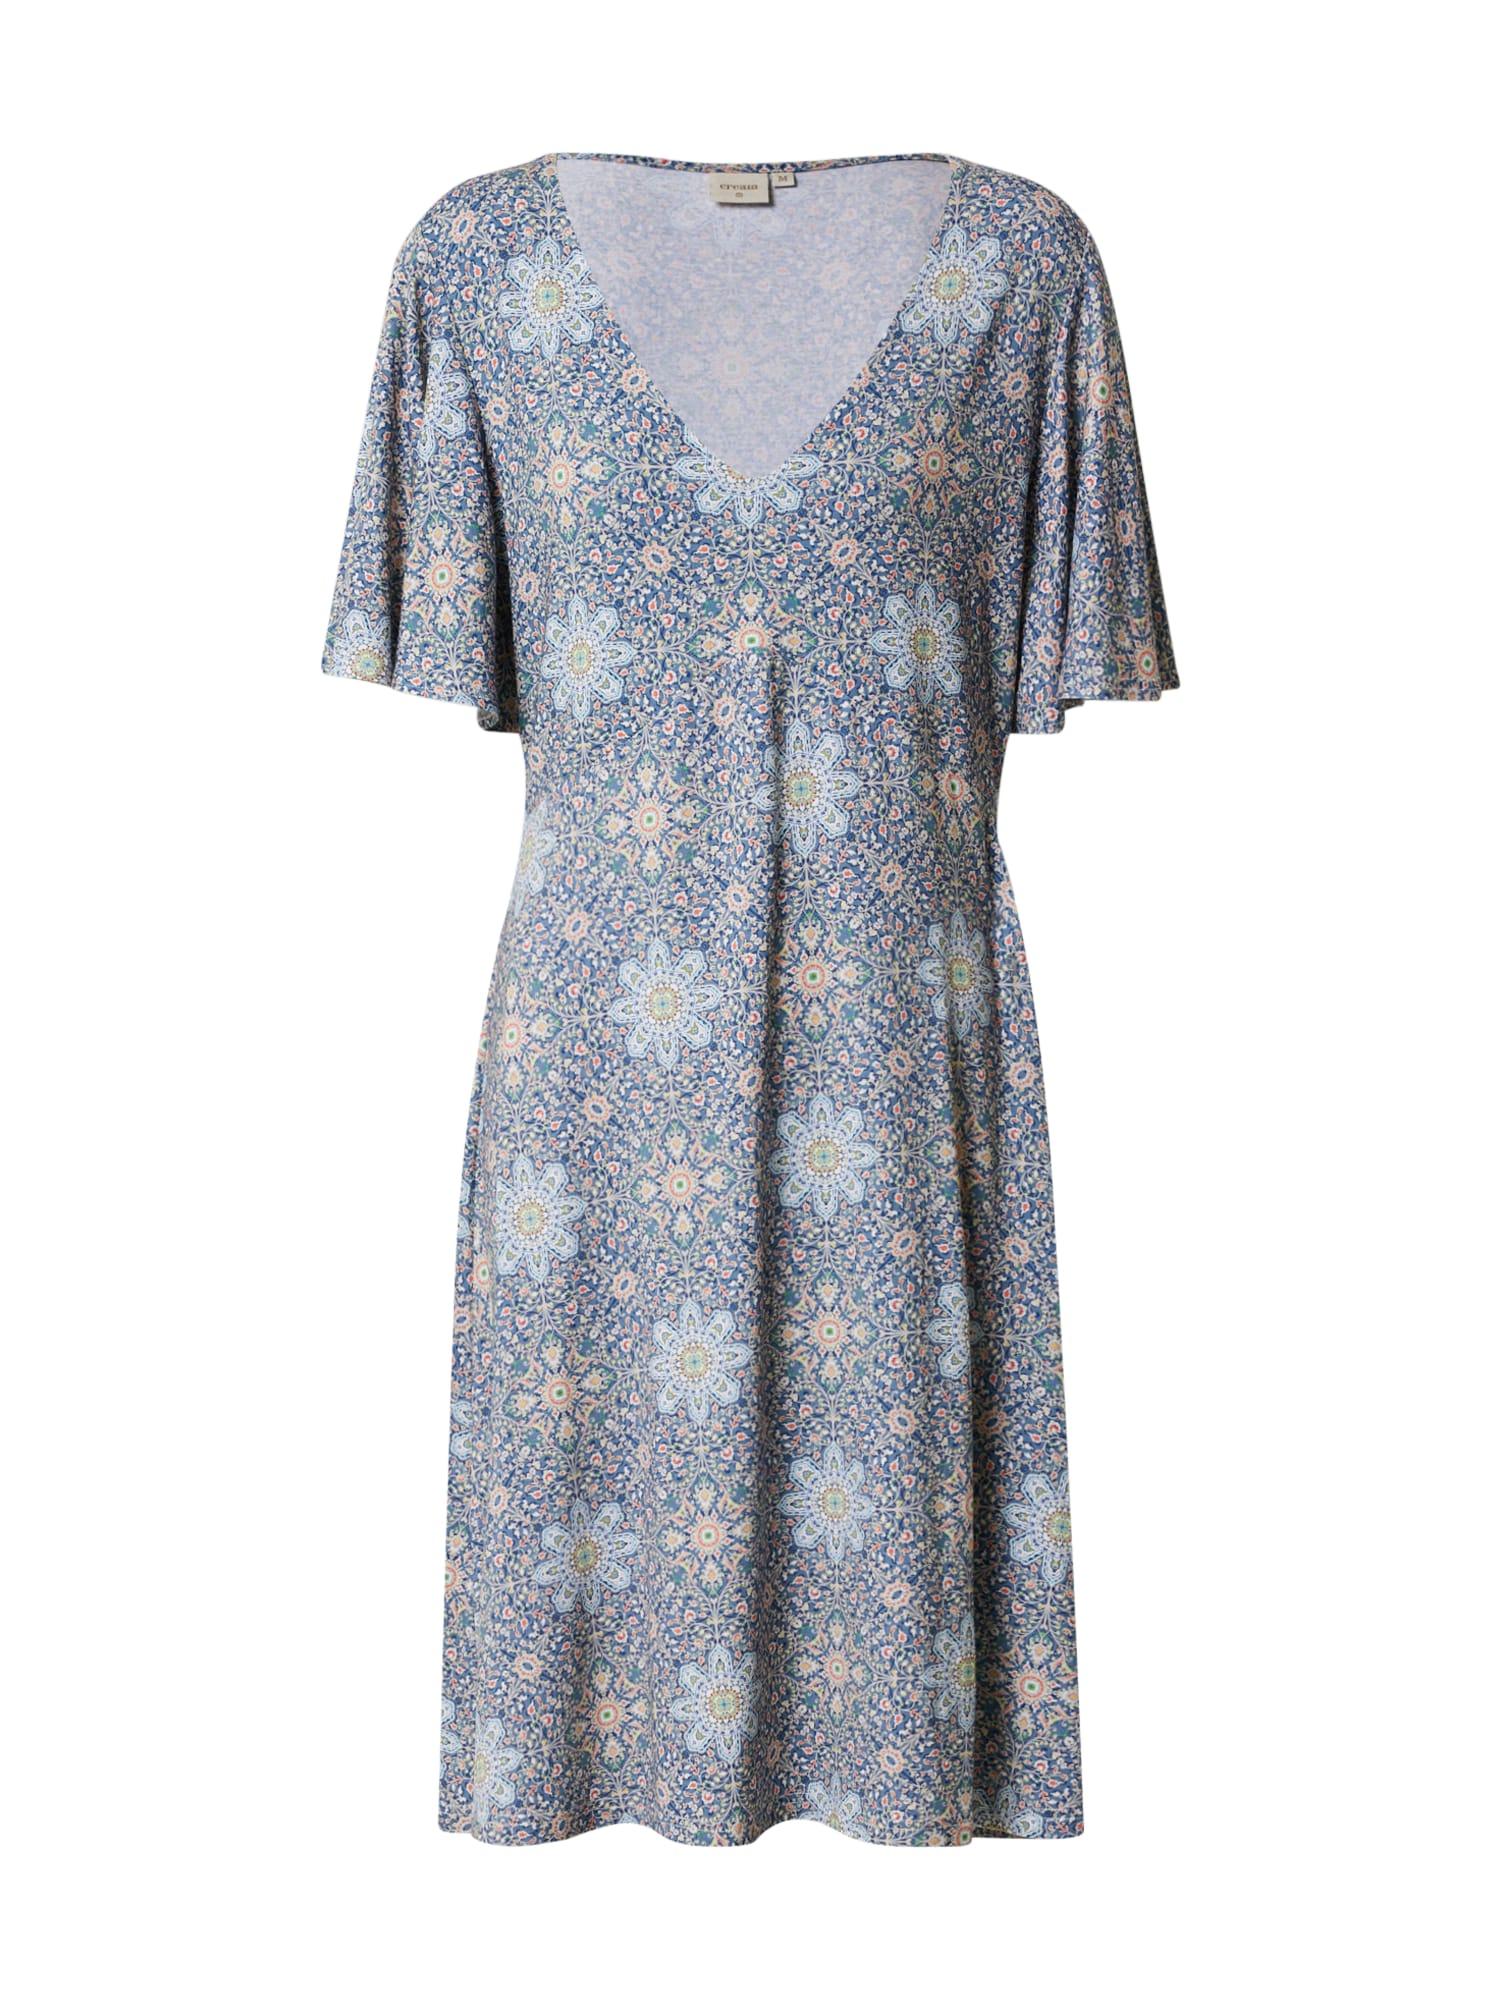 Cream Vasarinė suknelė 'Ava' vilnos balta / mėlyna dūmų spalva